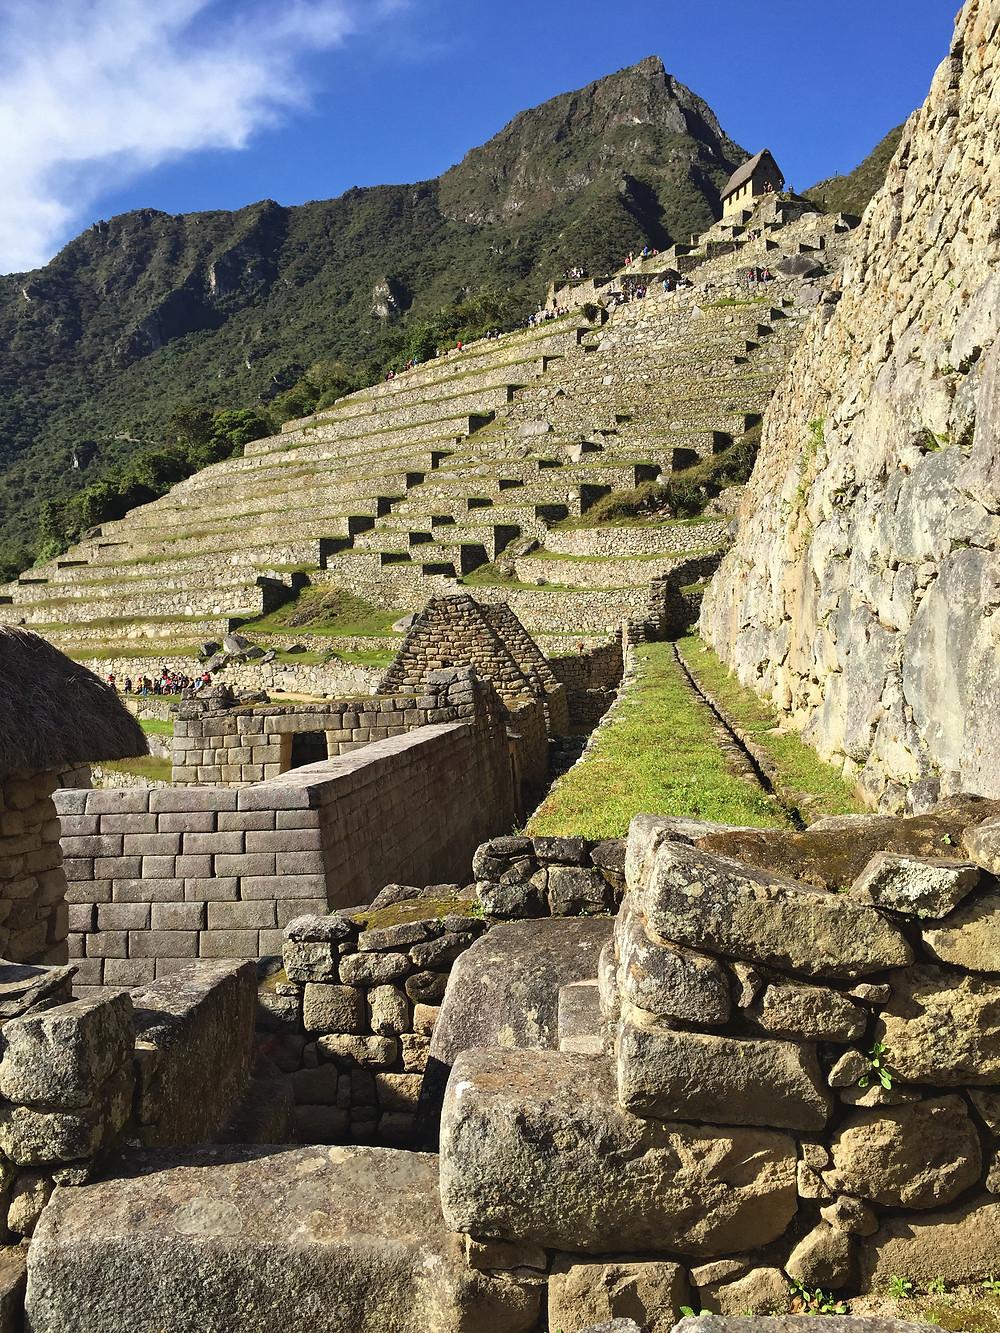 Surroundings of Machu Picchu